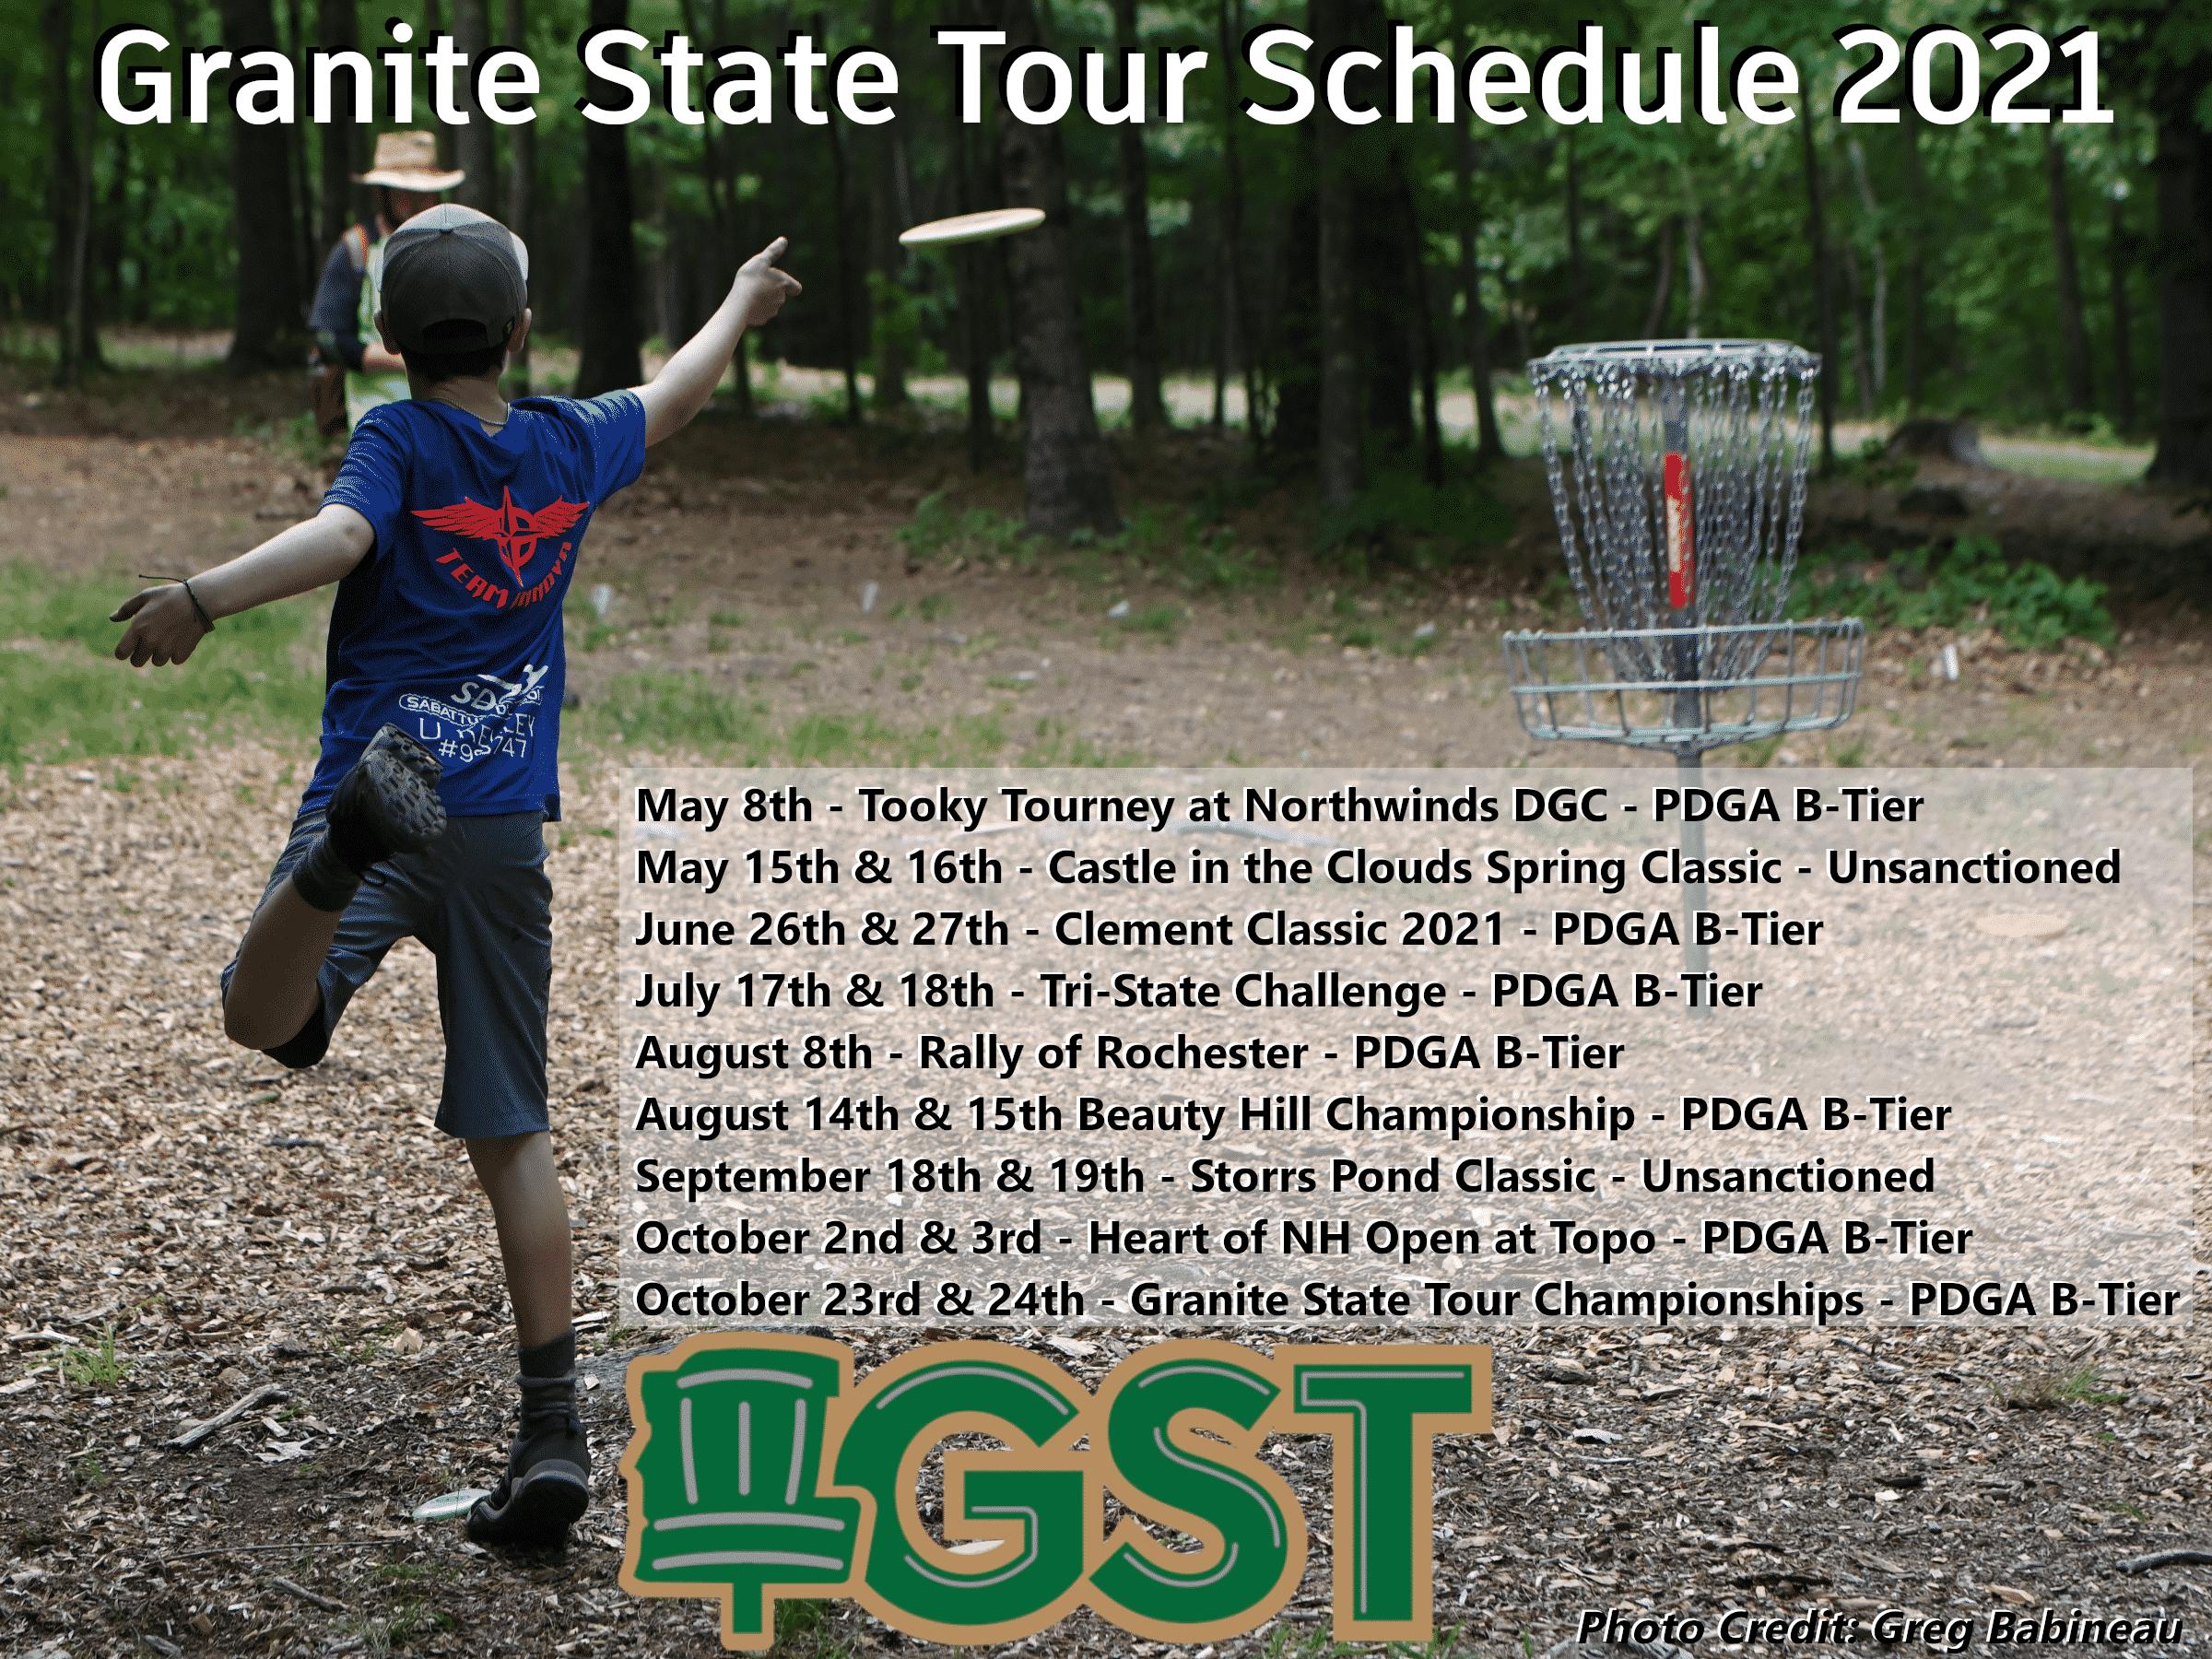 Tour schedule 2021 Granite State disc golf Tour